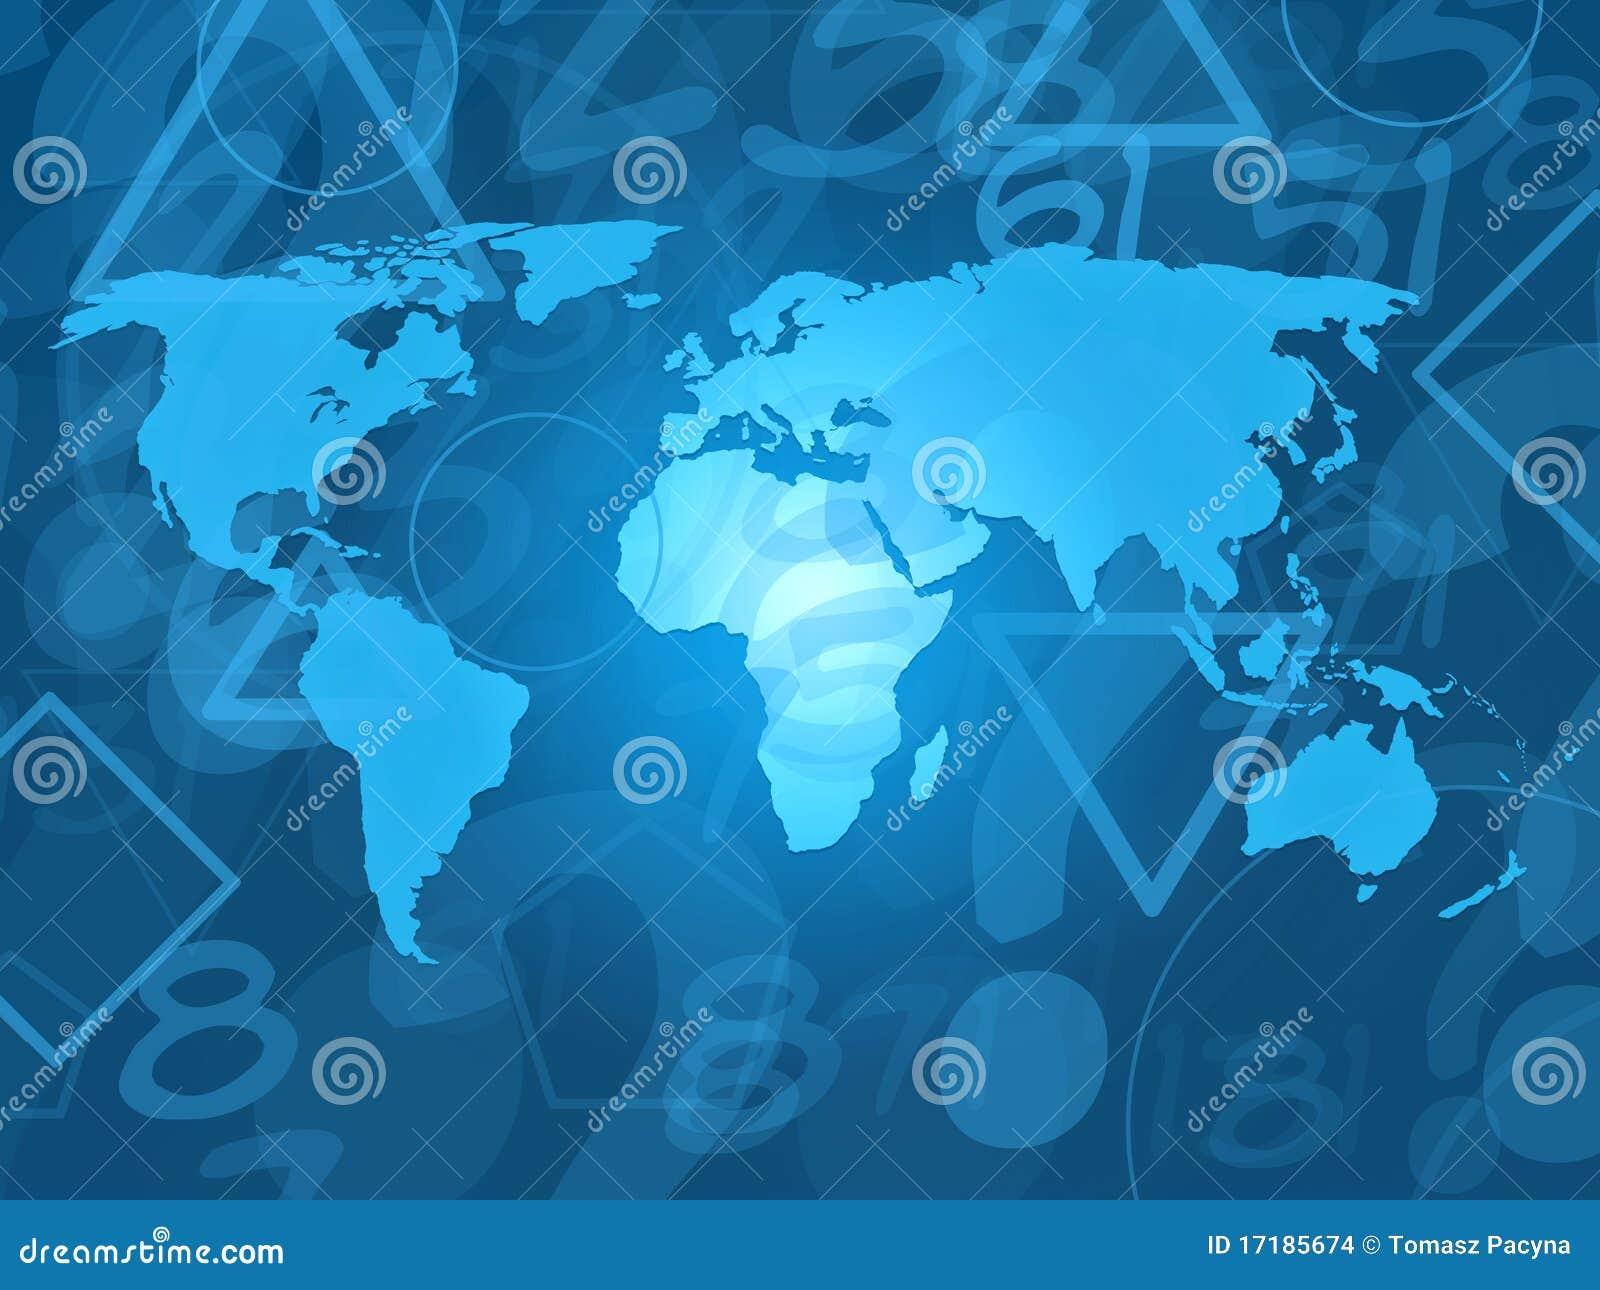 Random World Map.World Map With Random Letters Stock Illustration Illustration Of